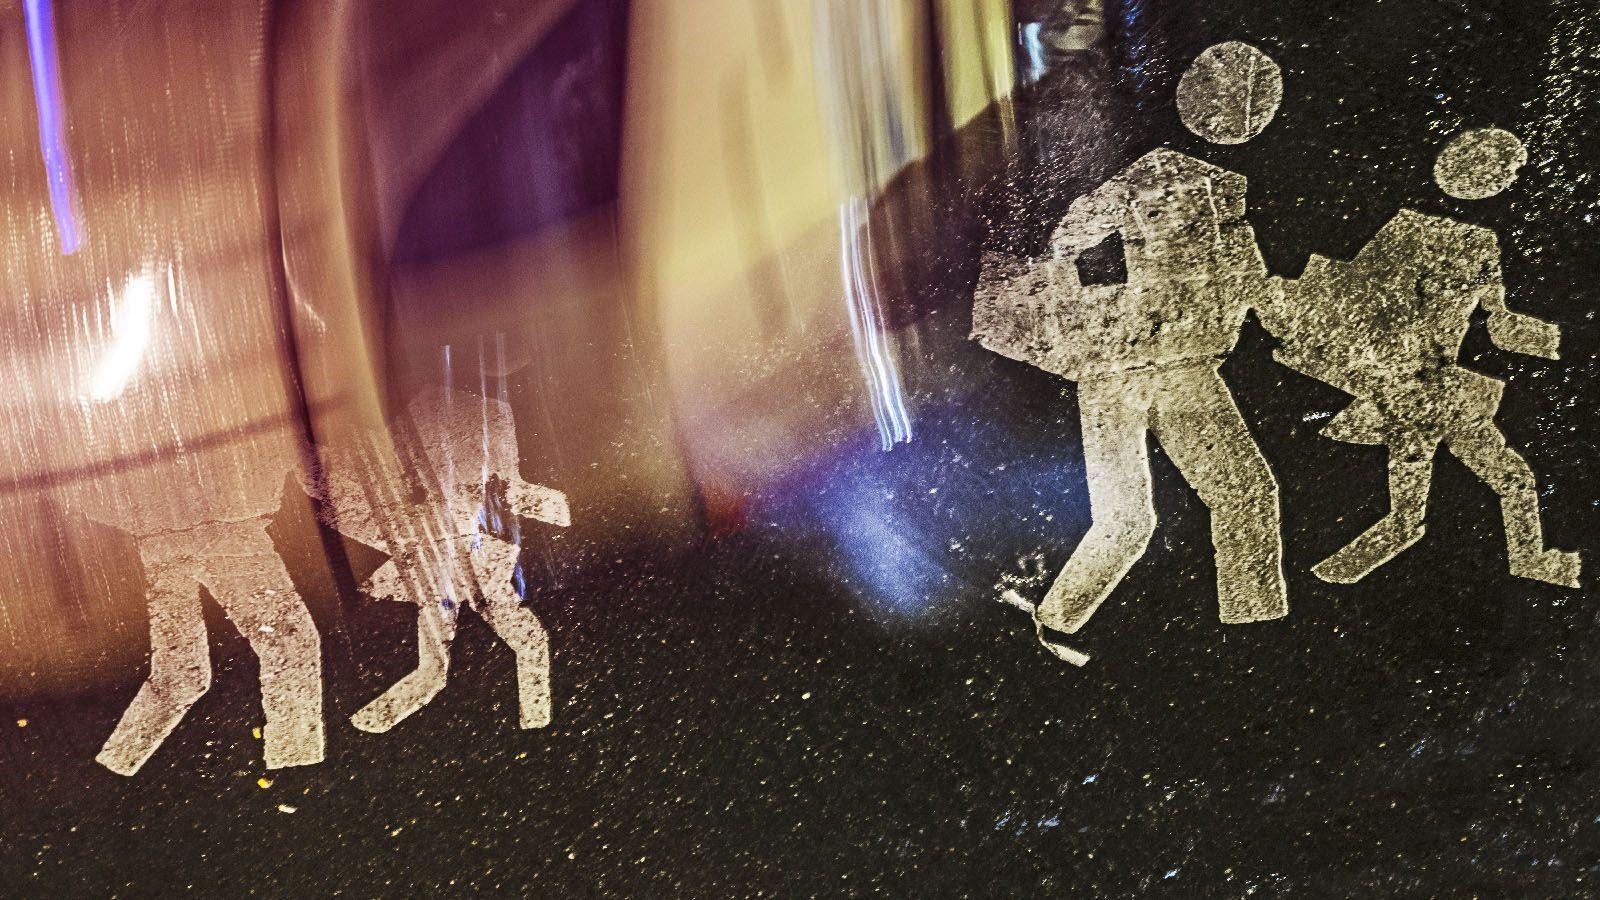 street photography xisco fuster 2 peatones